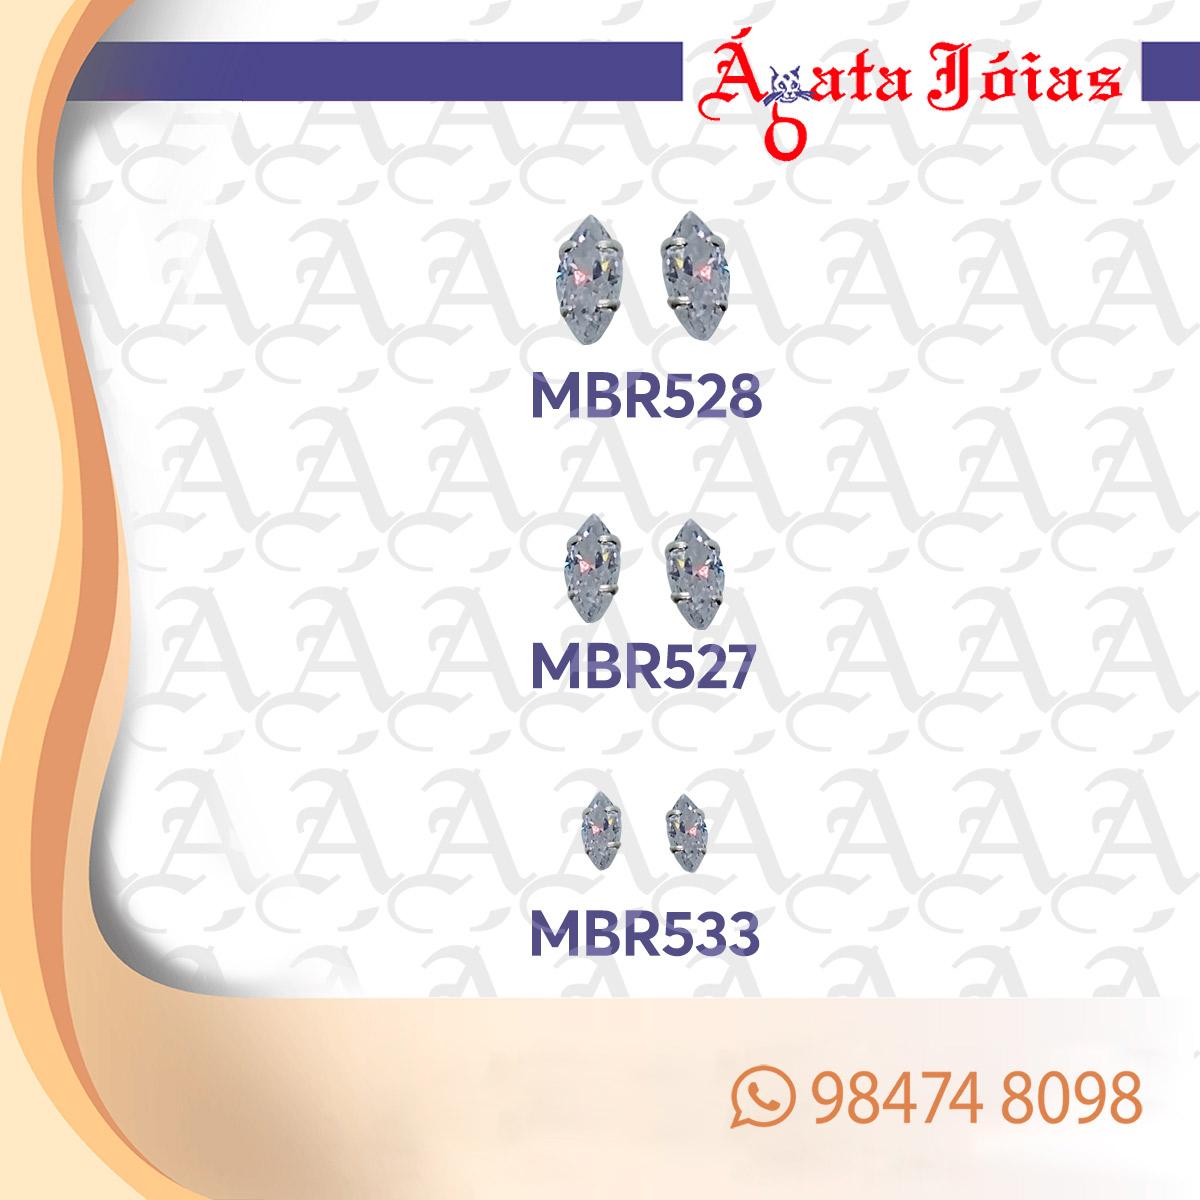 MBR533